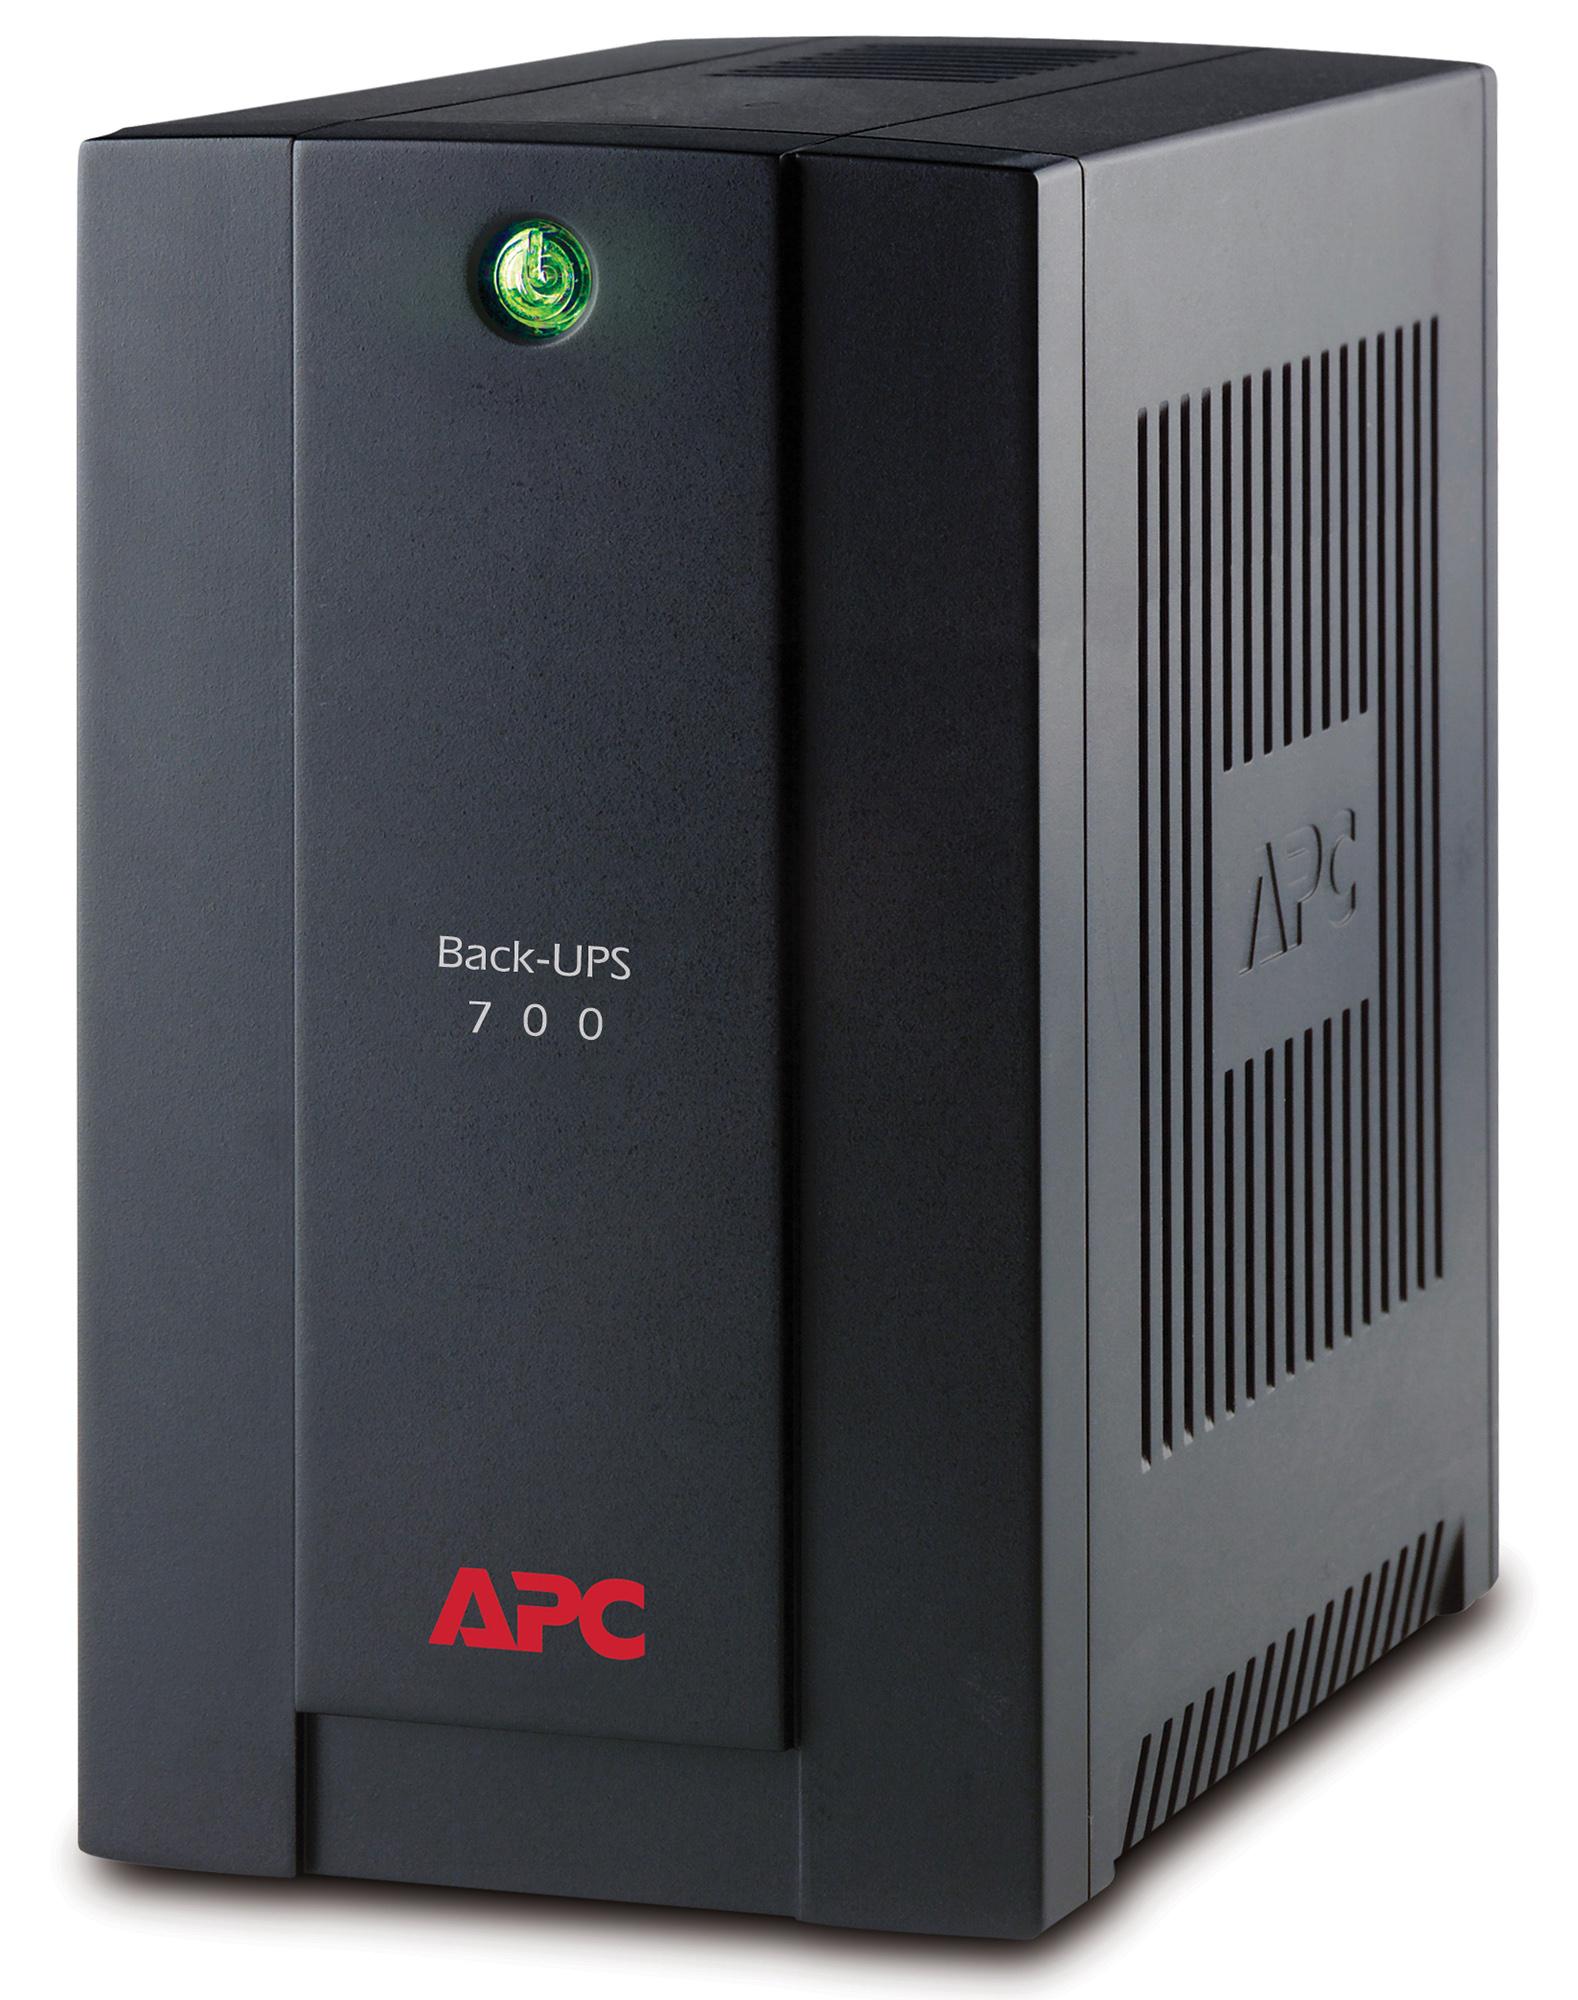 APC Back-UPS uninterruptible power supply (UPS) Line-Interactive 700 VA 390 W 4 AC outlet(s)